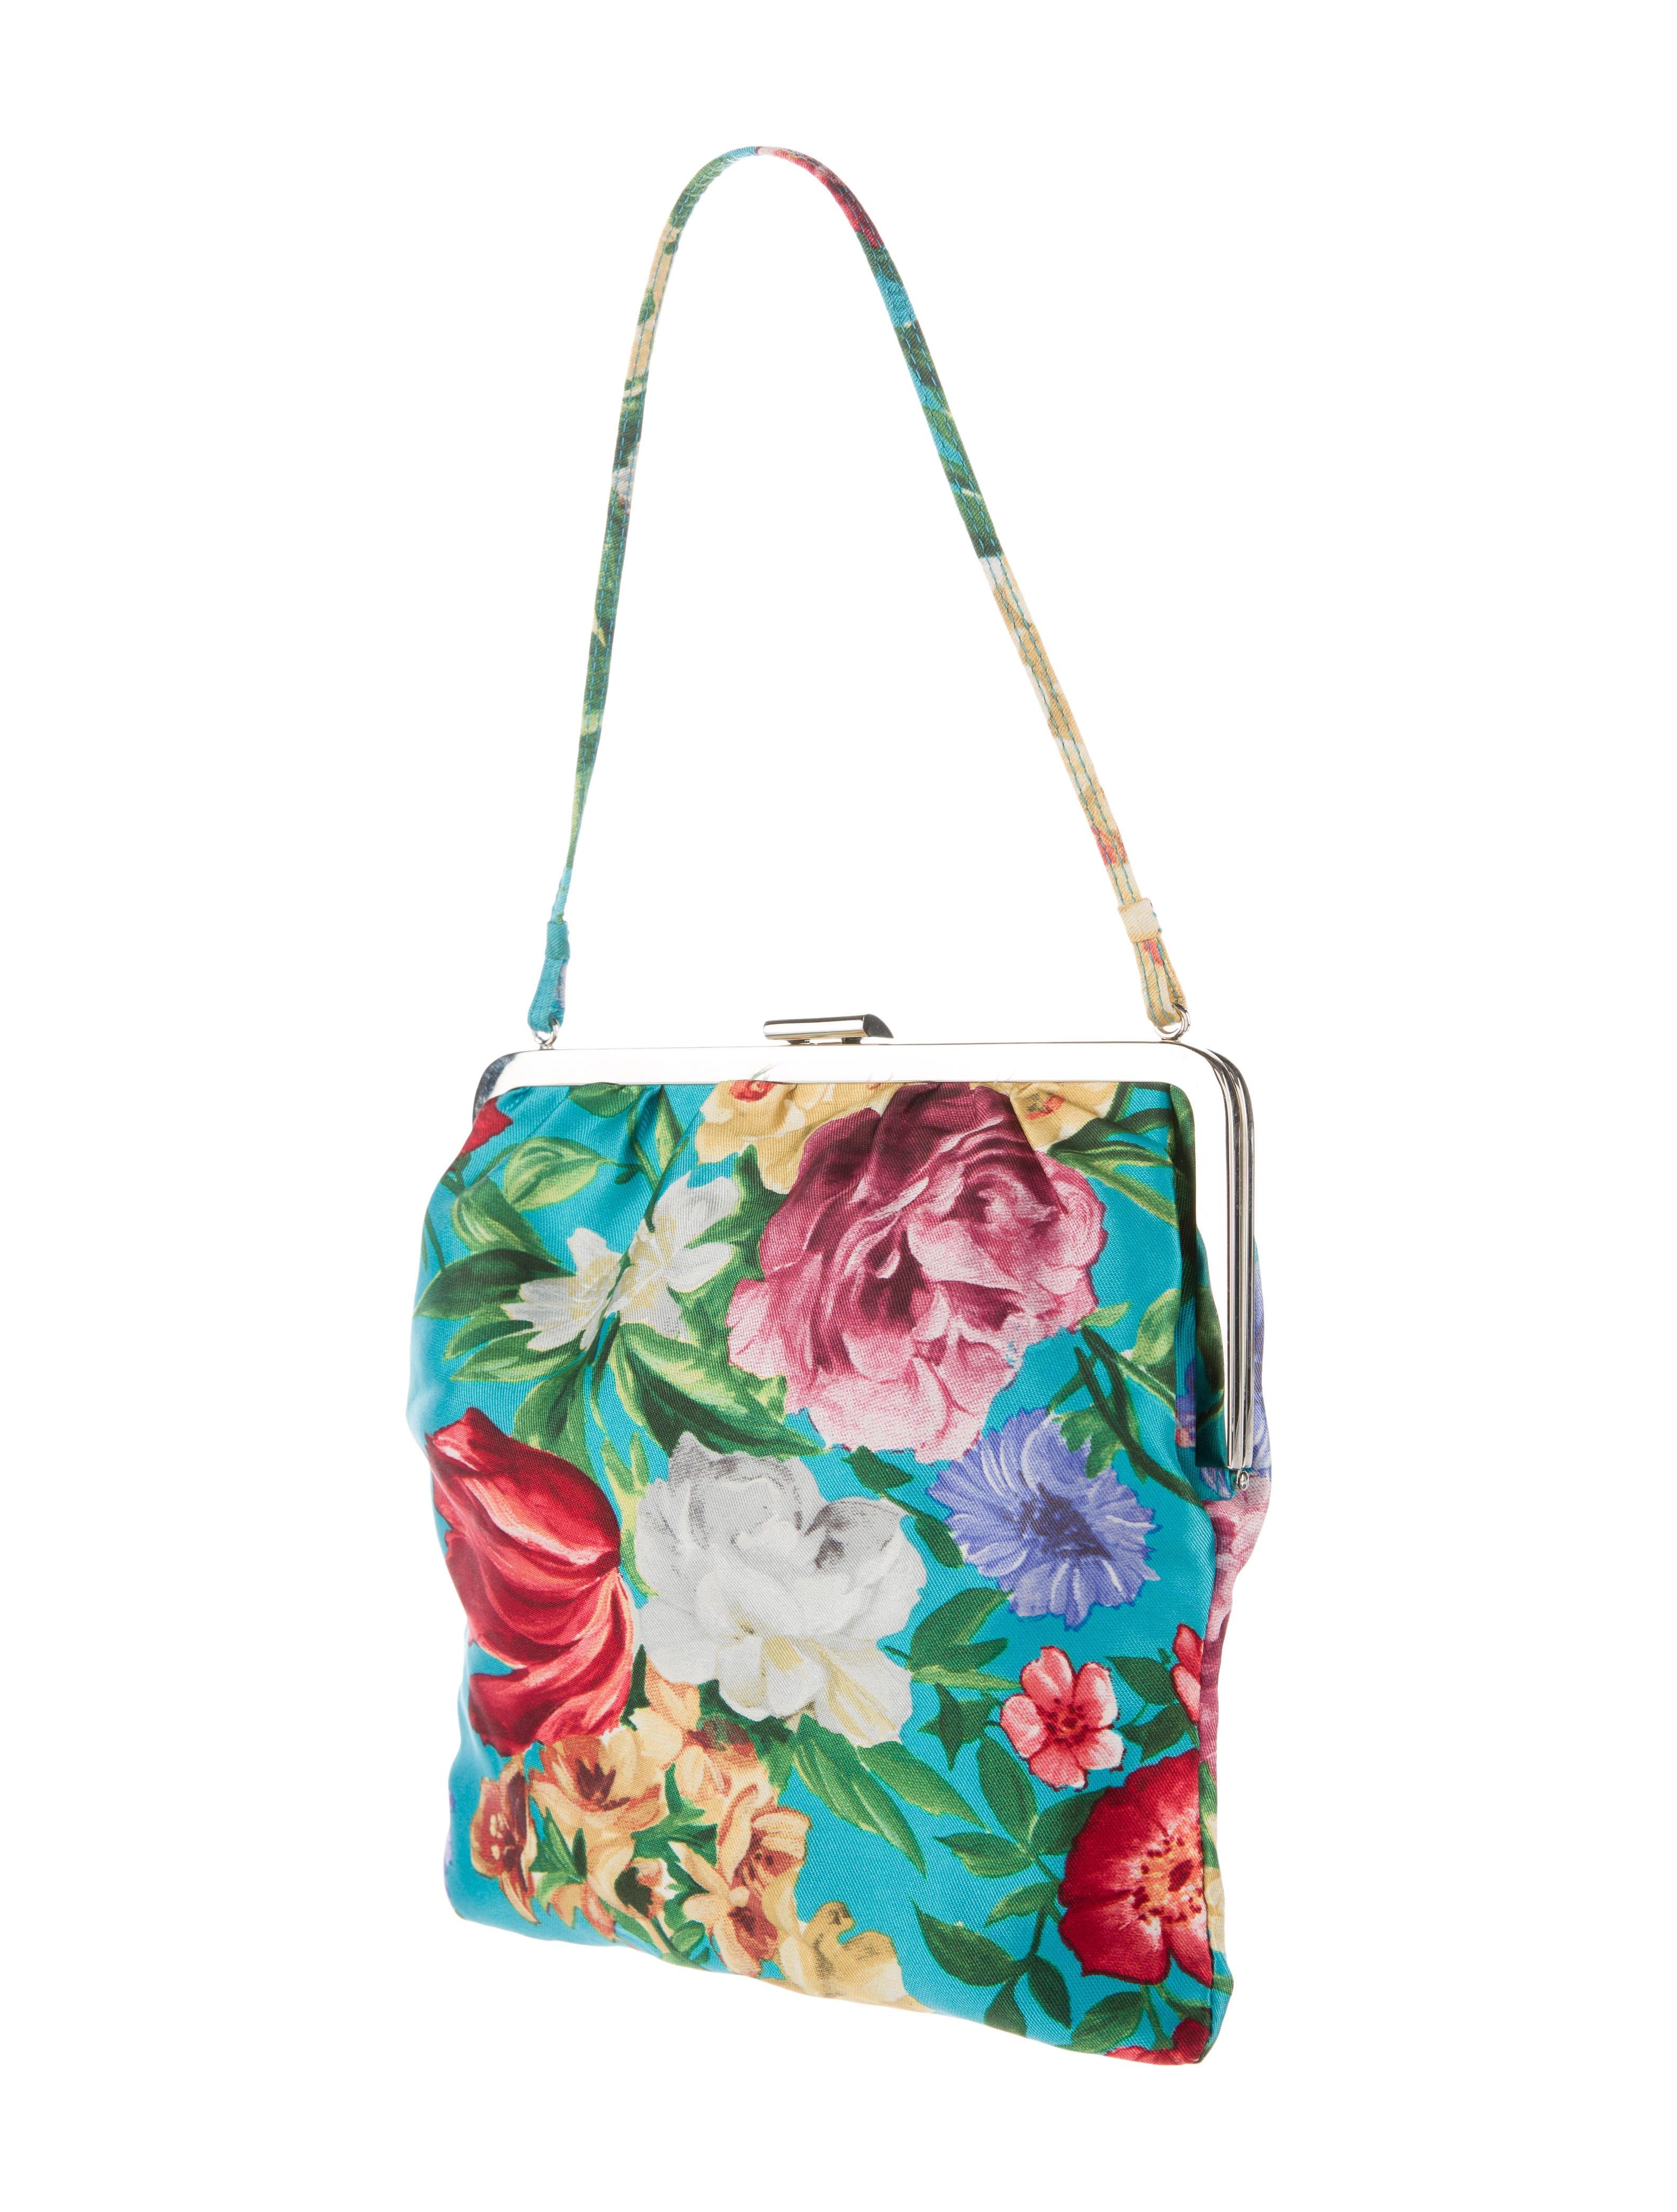 Dolce U0026 Gabbana Floral Satin Evening Bag - Handbags - DAG61343 | The RealReal